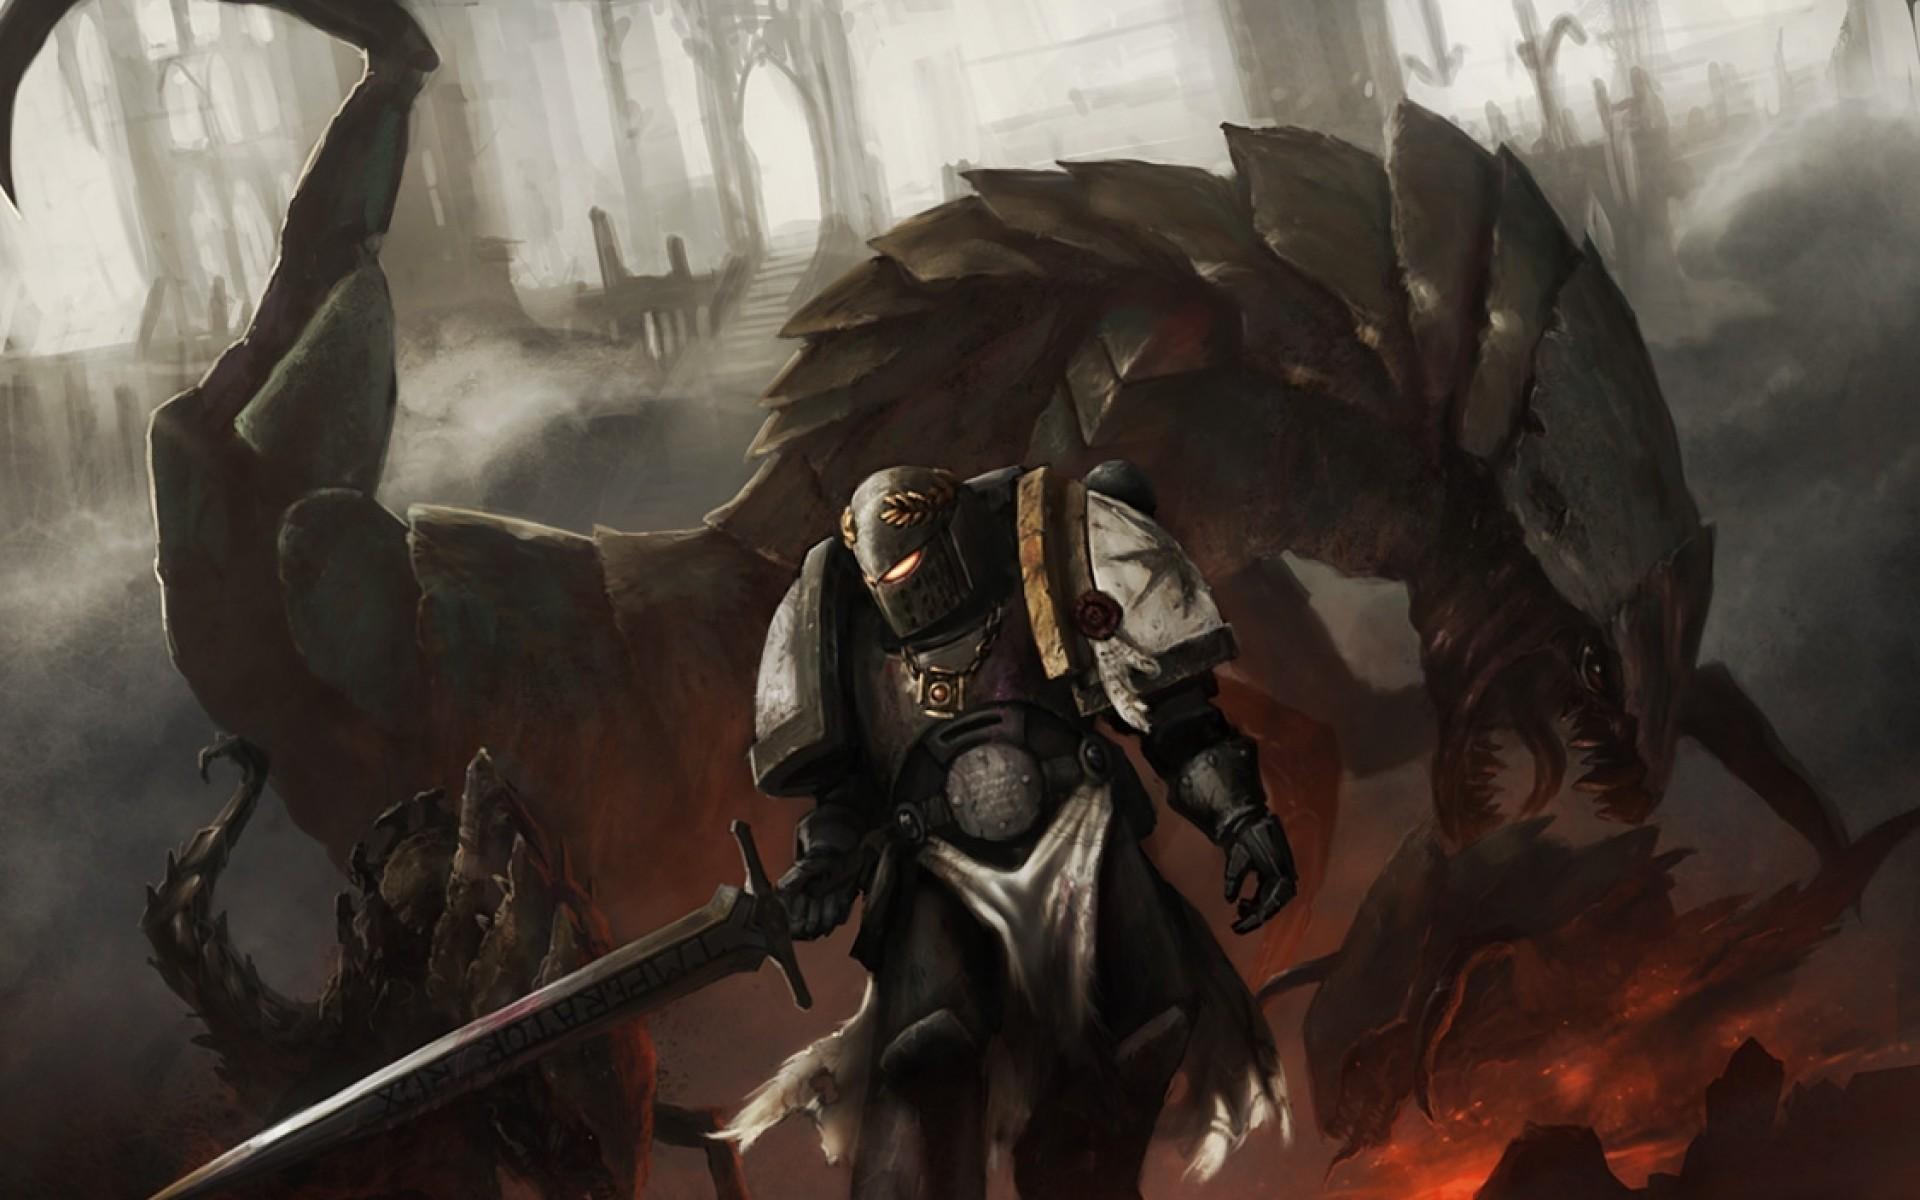 Image – Warhammer 40k space marine artwork tyranids black templar 1125×812 wallpaper  Wallpaper www.wallmay.net.jpg | Warhammer 40k | FANDOM …